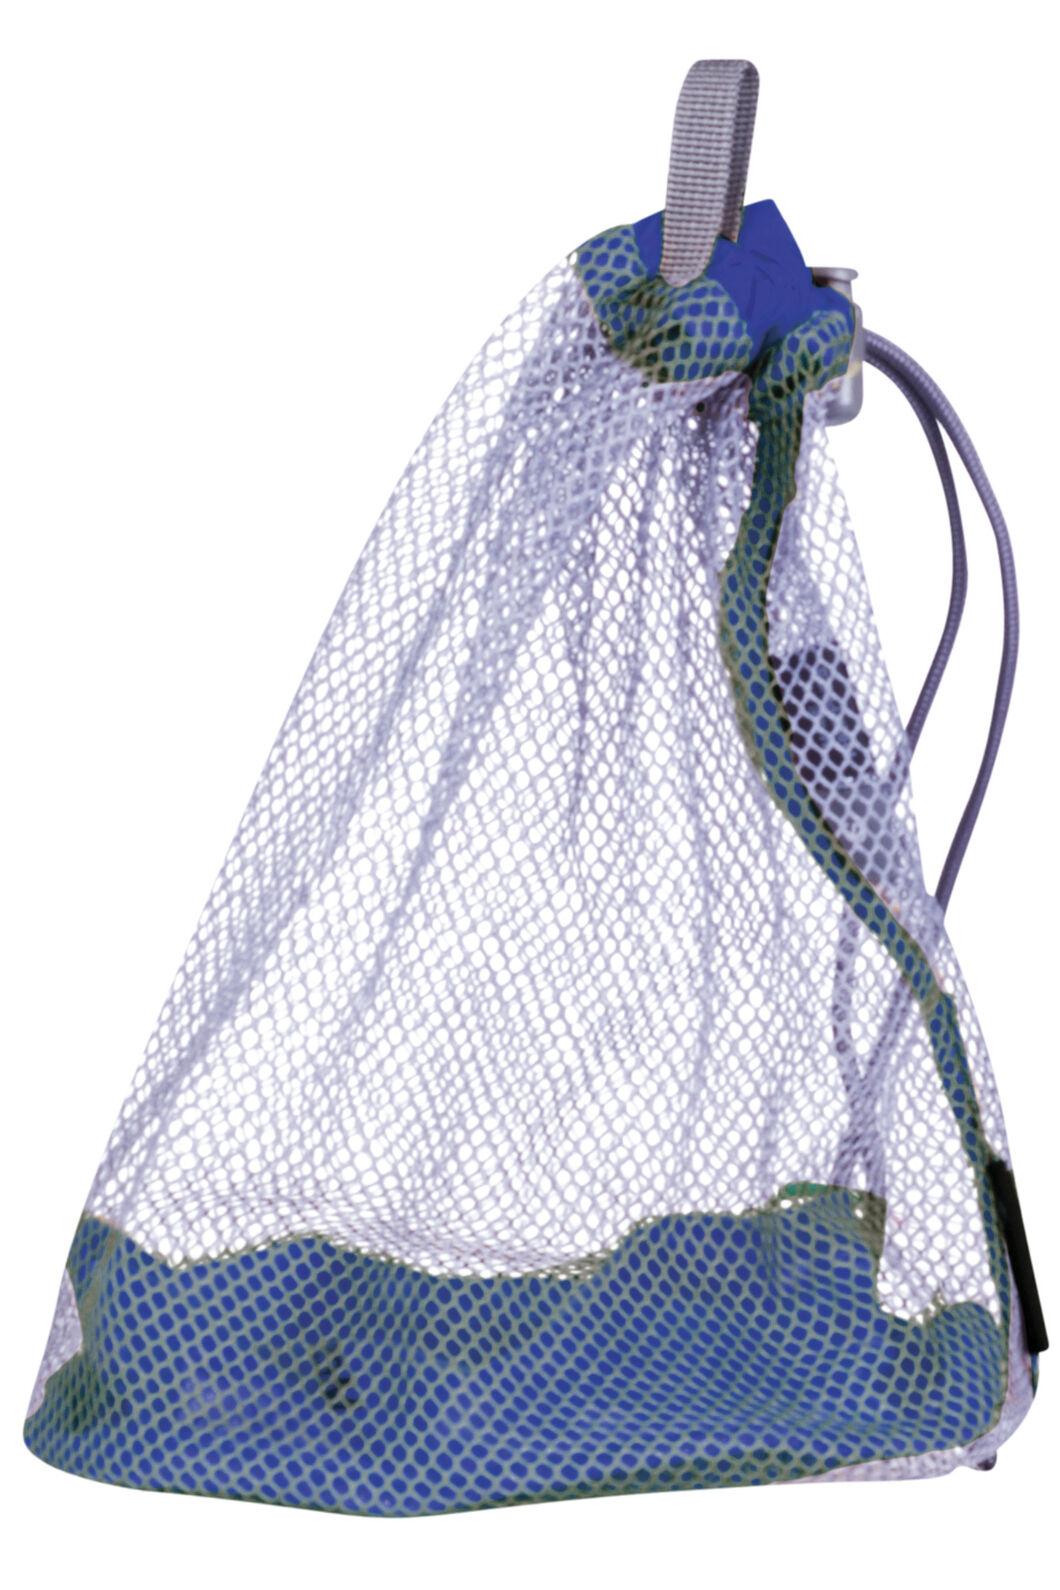 Macpac Mesh Stuff Sack Medium, Sodalite Blue, hi-res